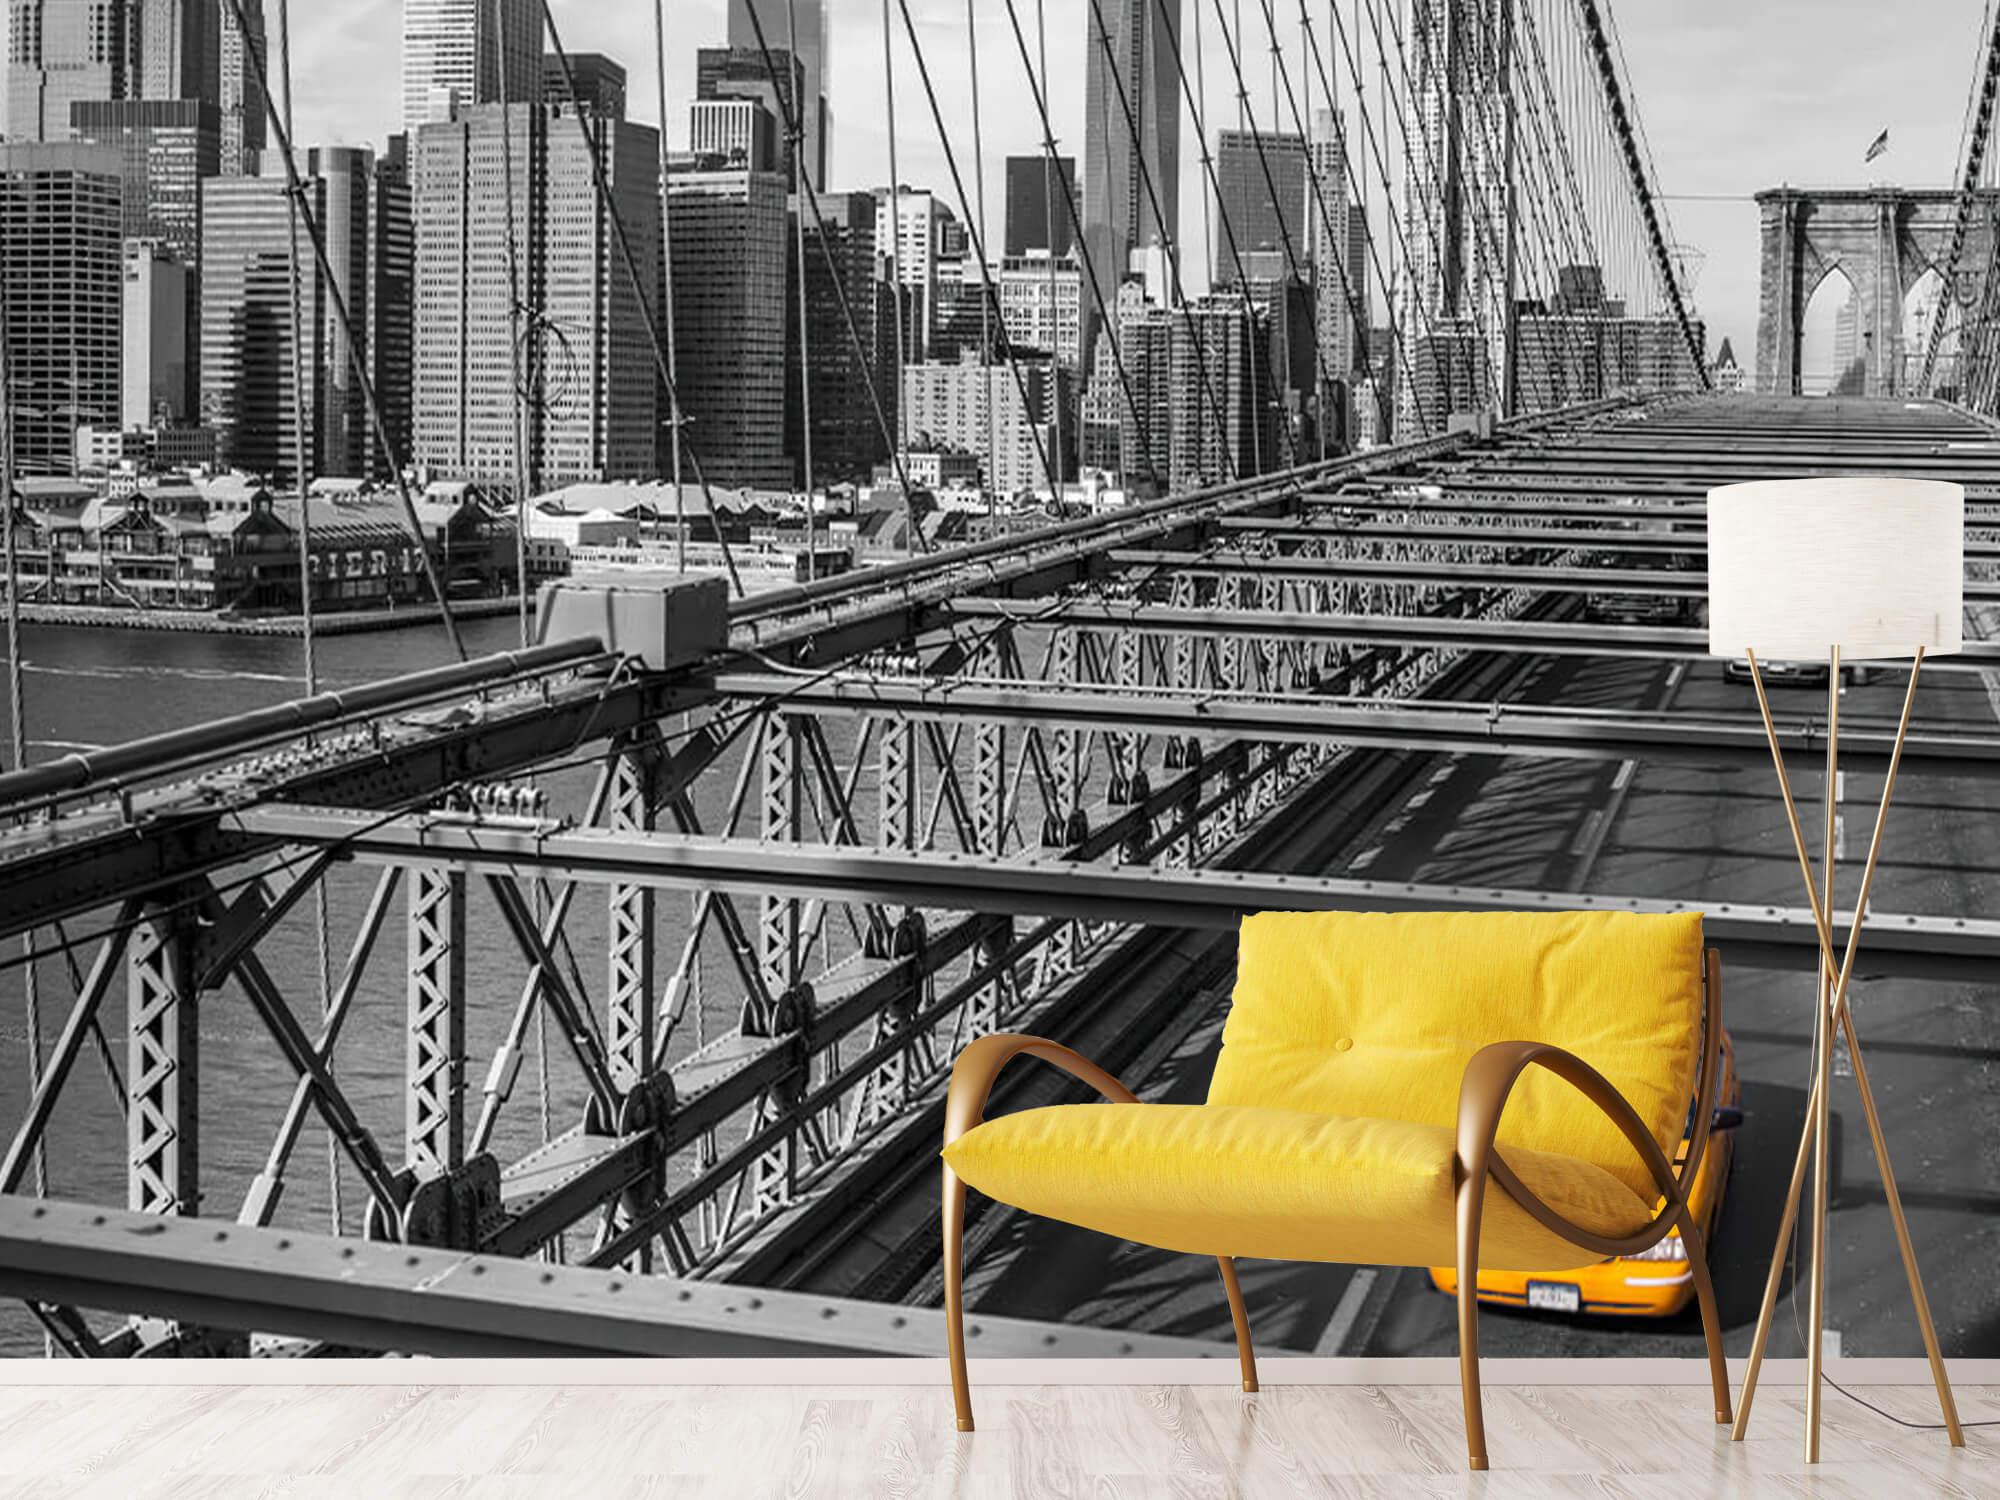 Un taxi sur le pont de Brooklyn 16